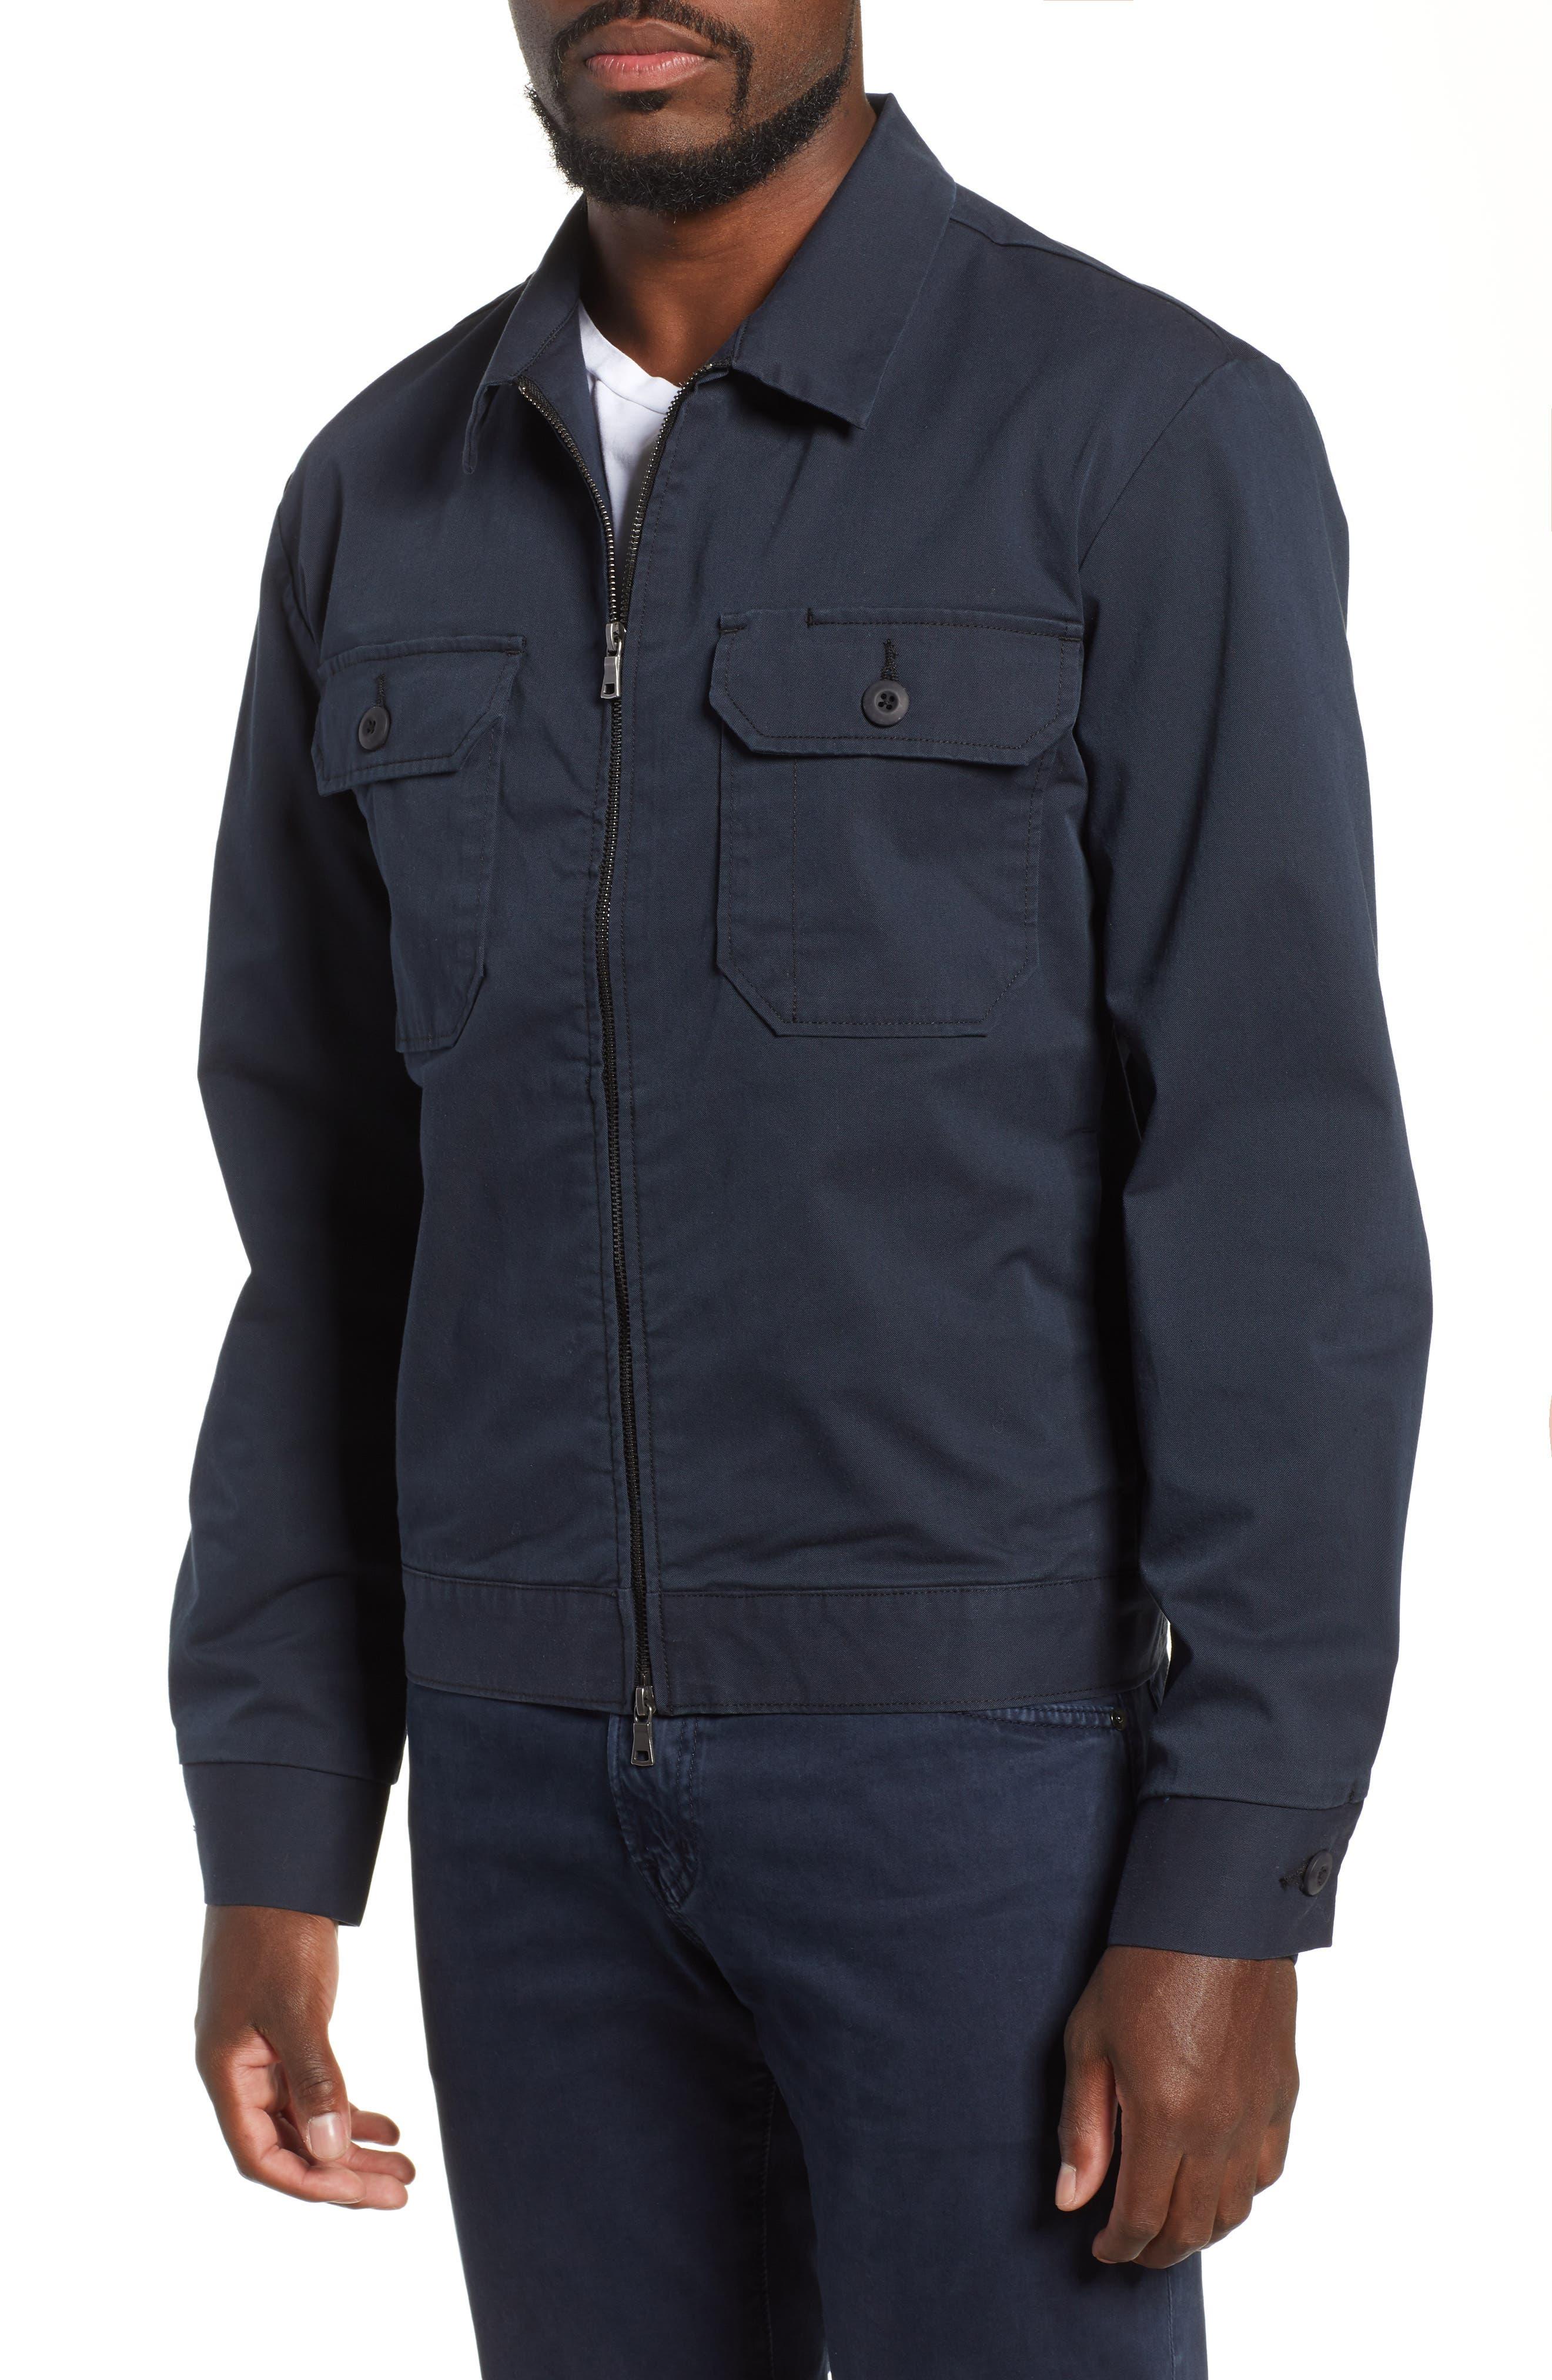 Axle Shop Regular Stretch Cotton Blend Jacket,                             Alternate thumbnail 4, color,                             BLUE VAULT/ BLACK